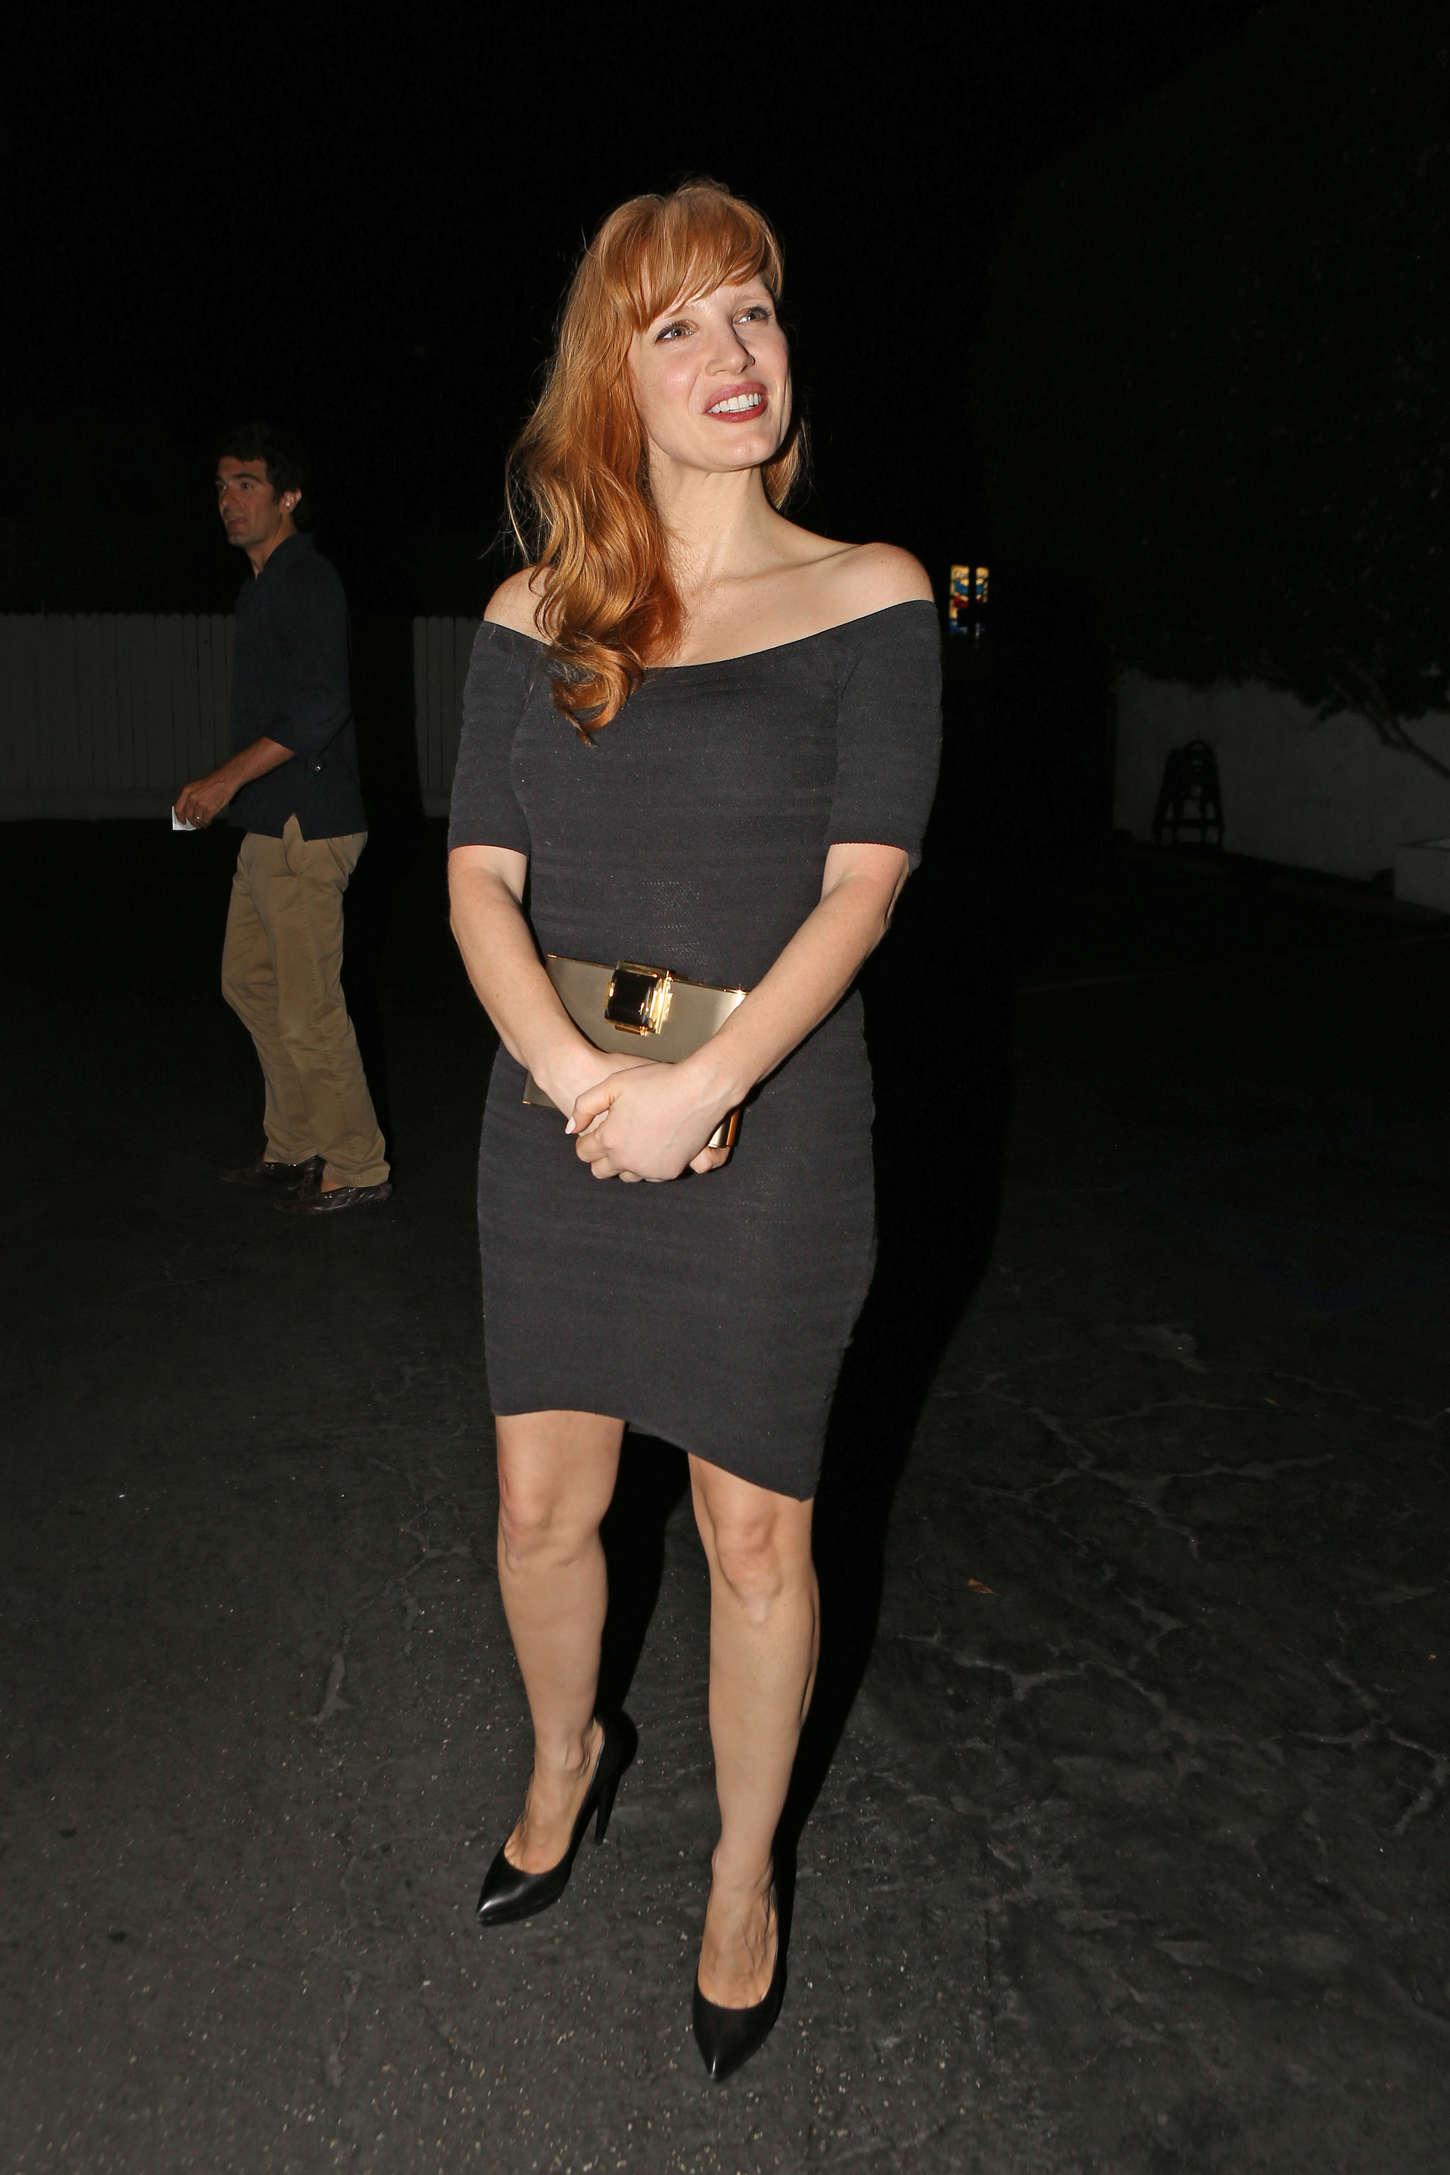 Jessica Chastain In Black Mini Dress 14 Gotceleb